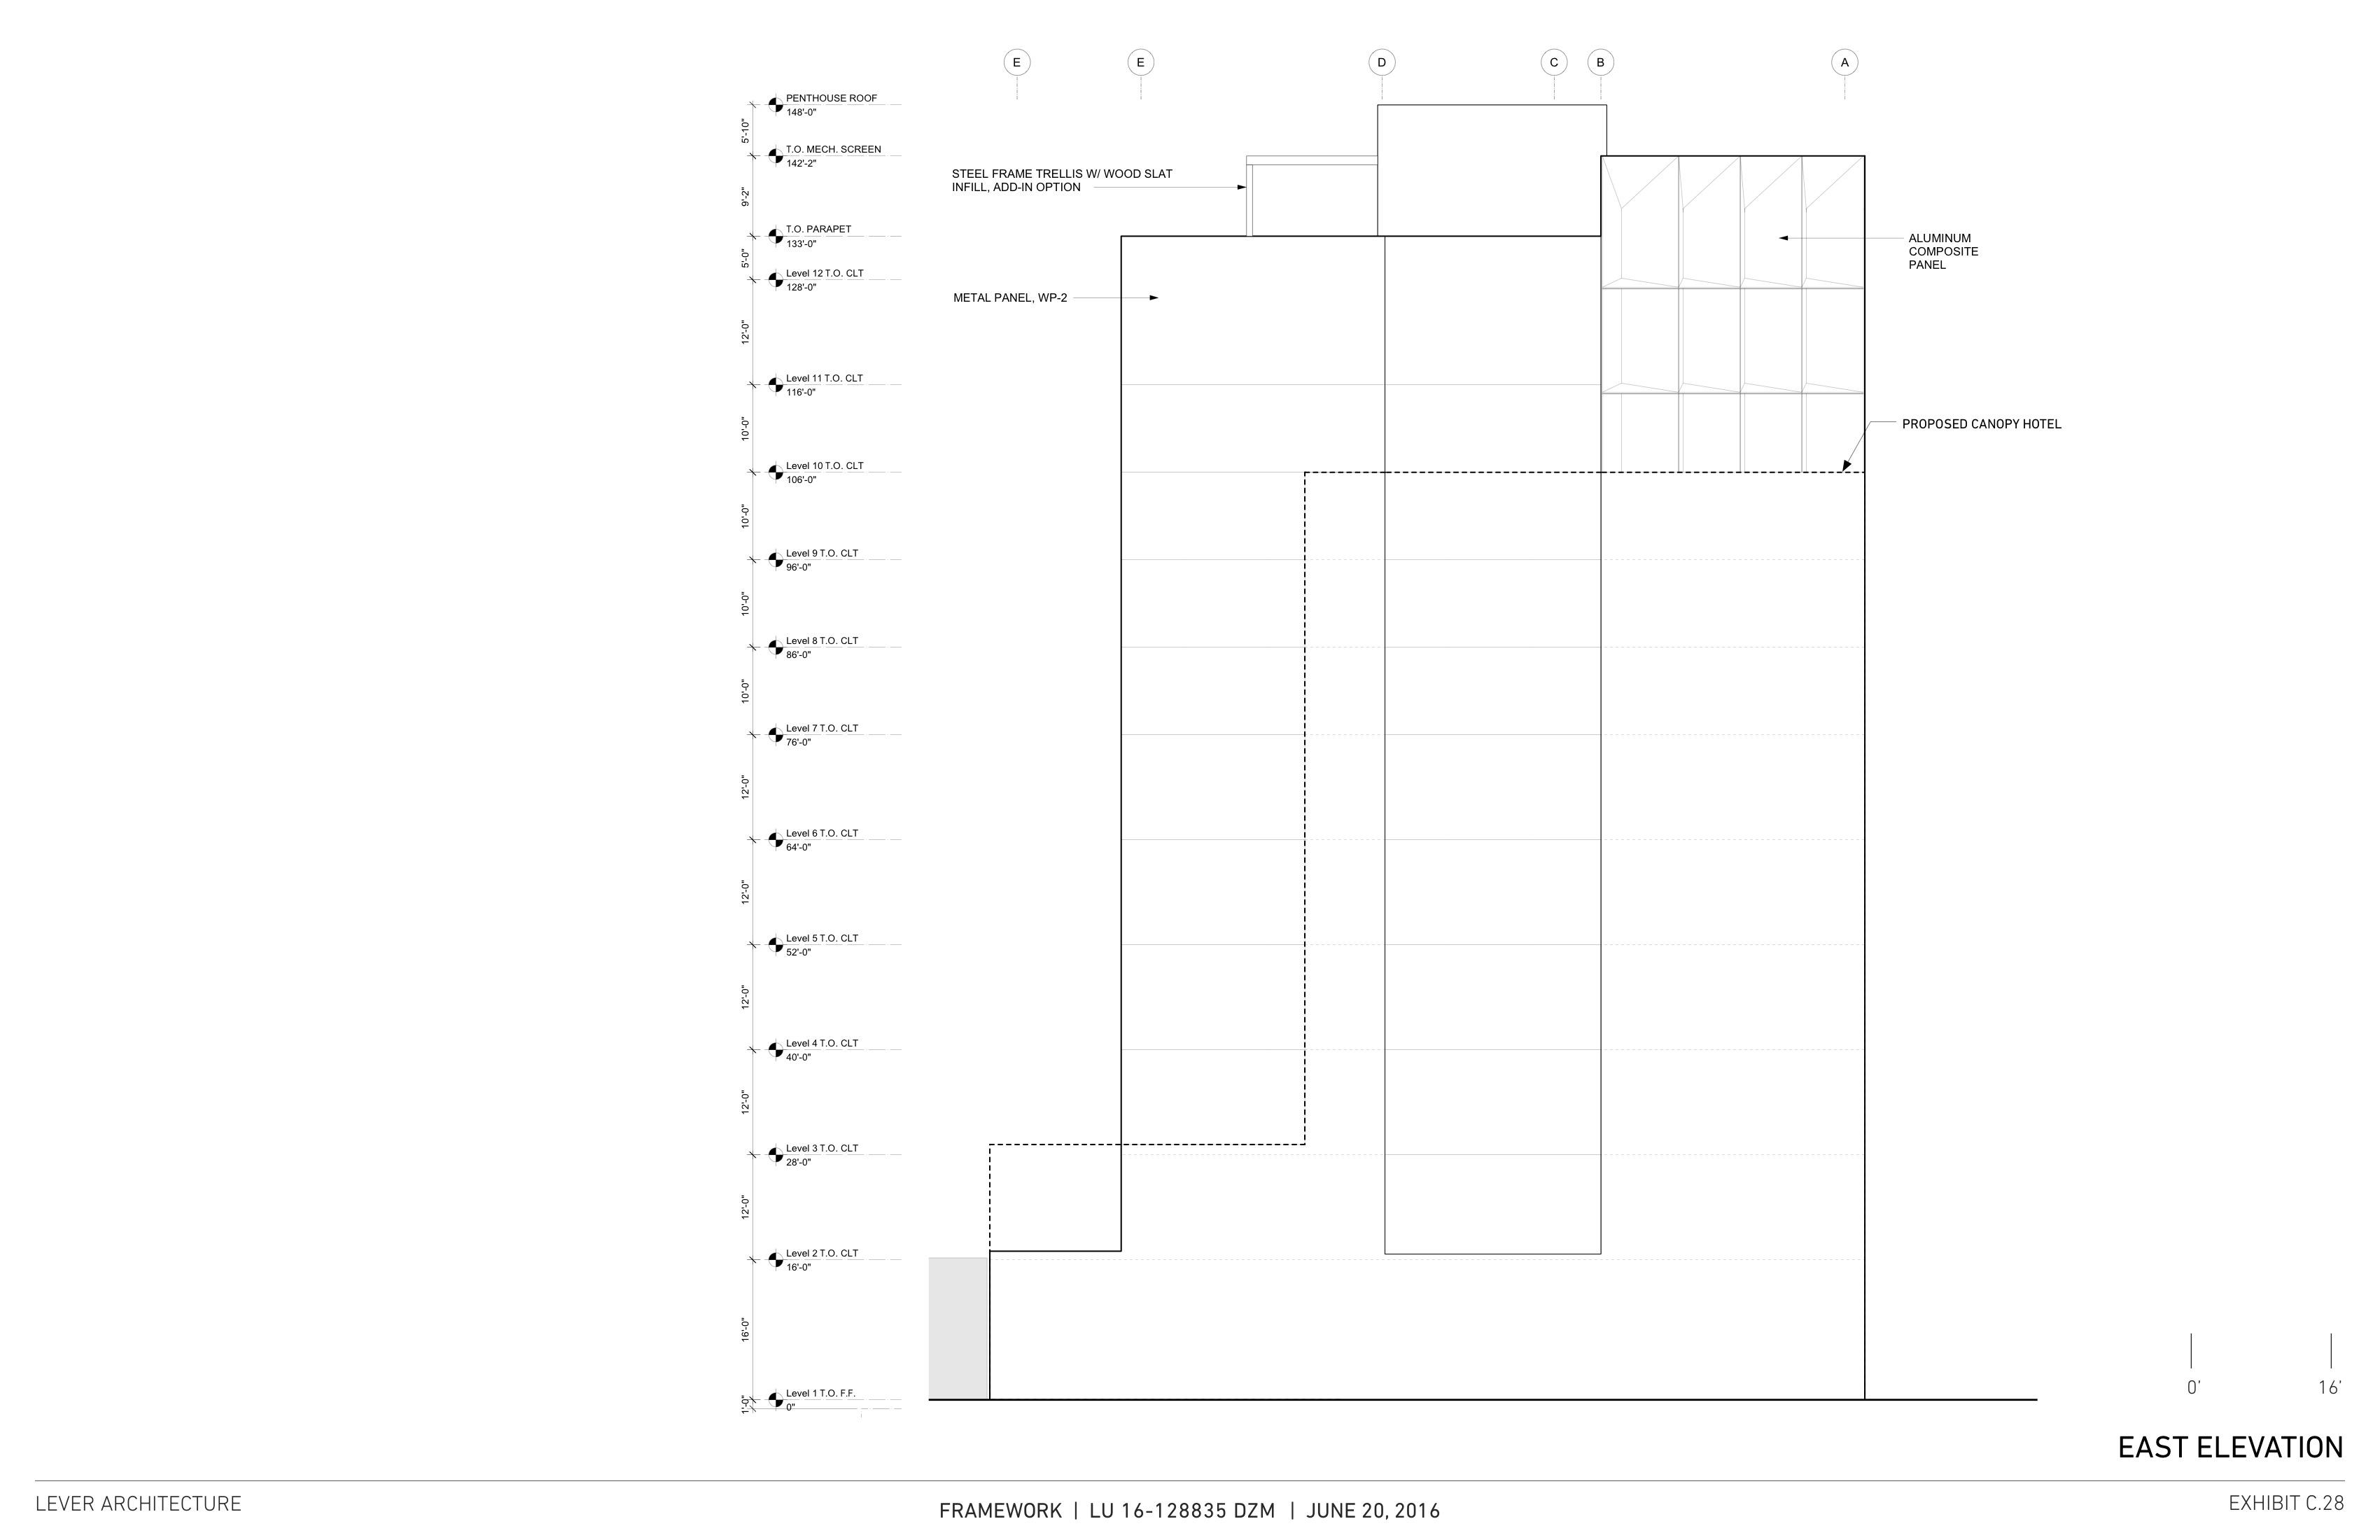 Framework Lever Architecture